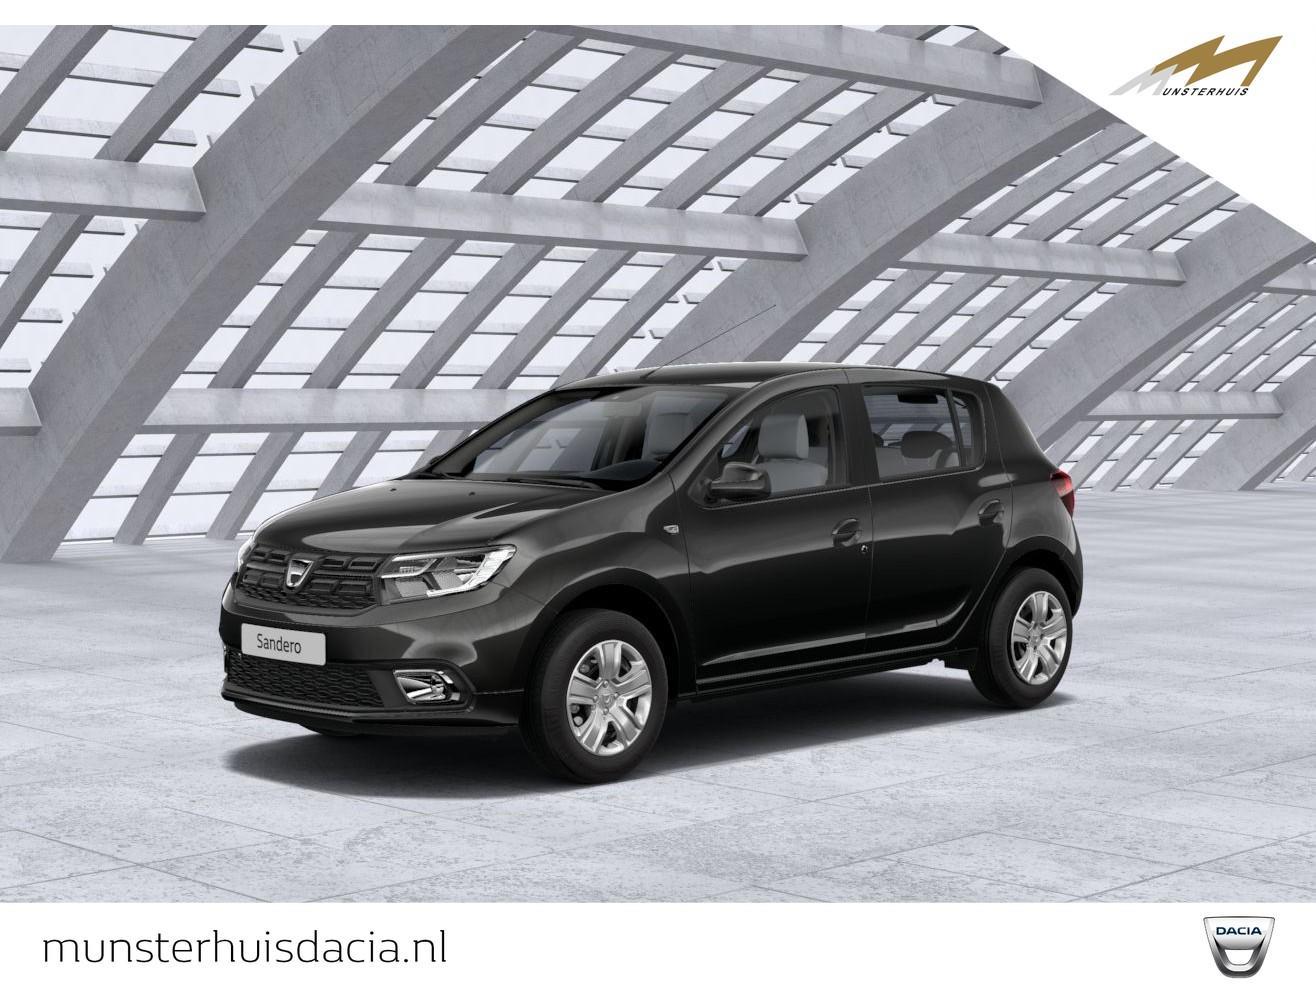 Dacia Sandero Tce 90 laureate - nieuw